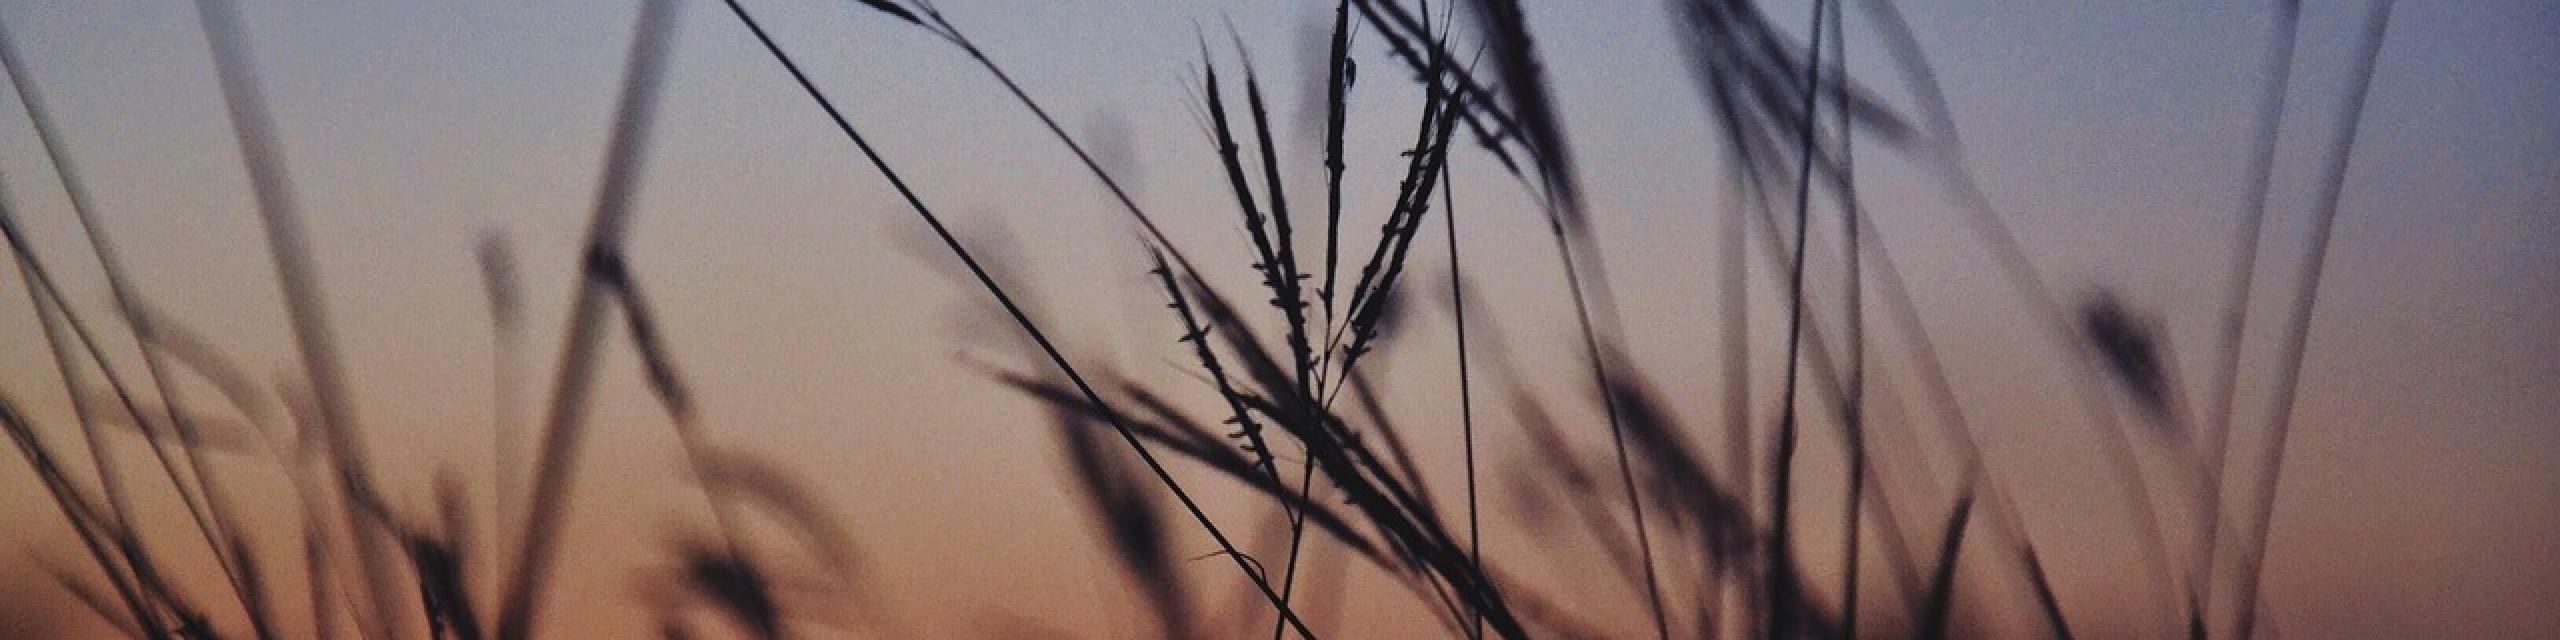 cropped-vegetation-691361_1280.jpg